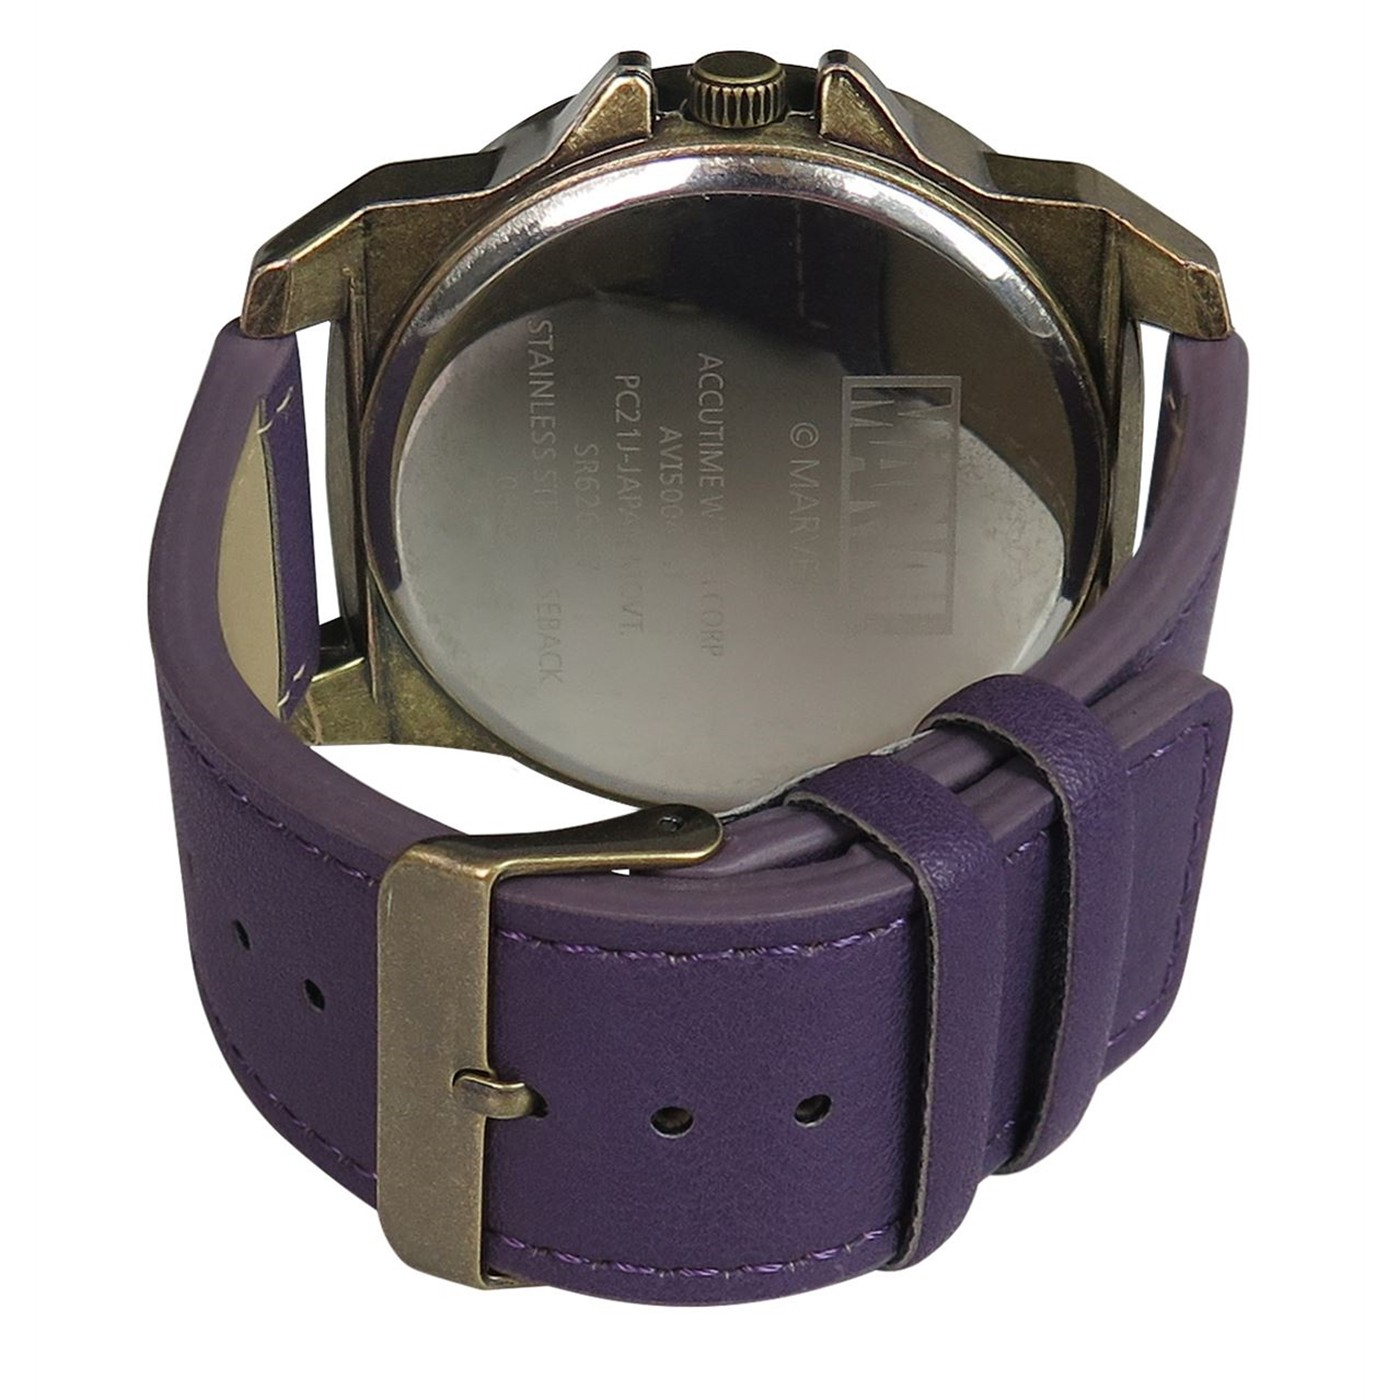 Infinity War Gauntlet Watch with Adjustable Strap